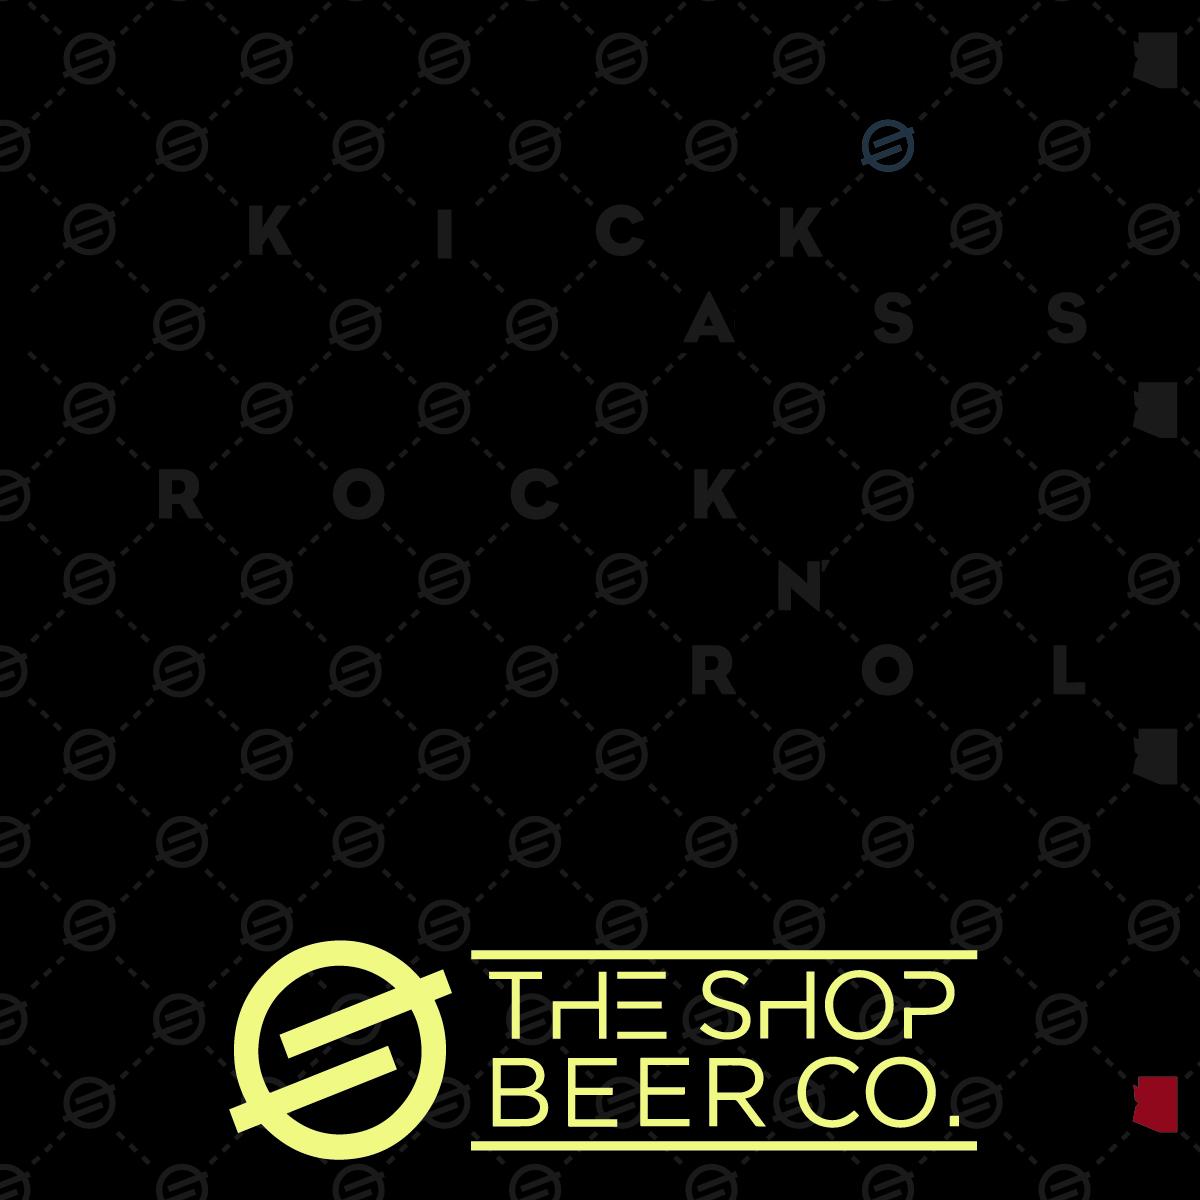 WebTab_generic_TheShopBeerCo_TempeAZ-01.jpg